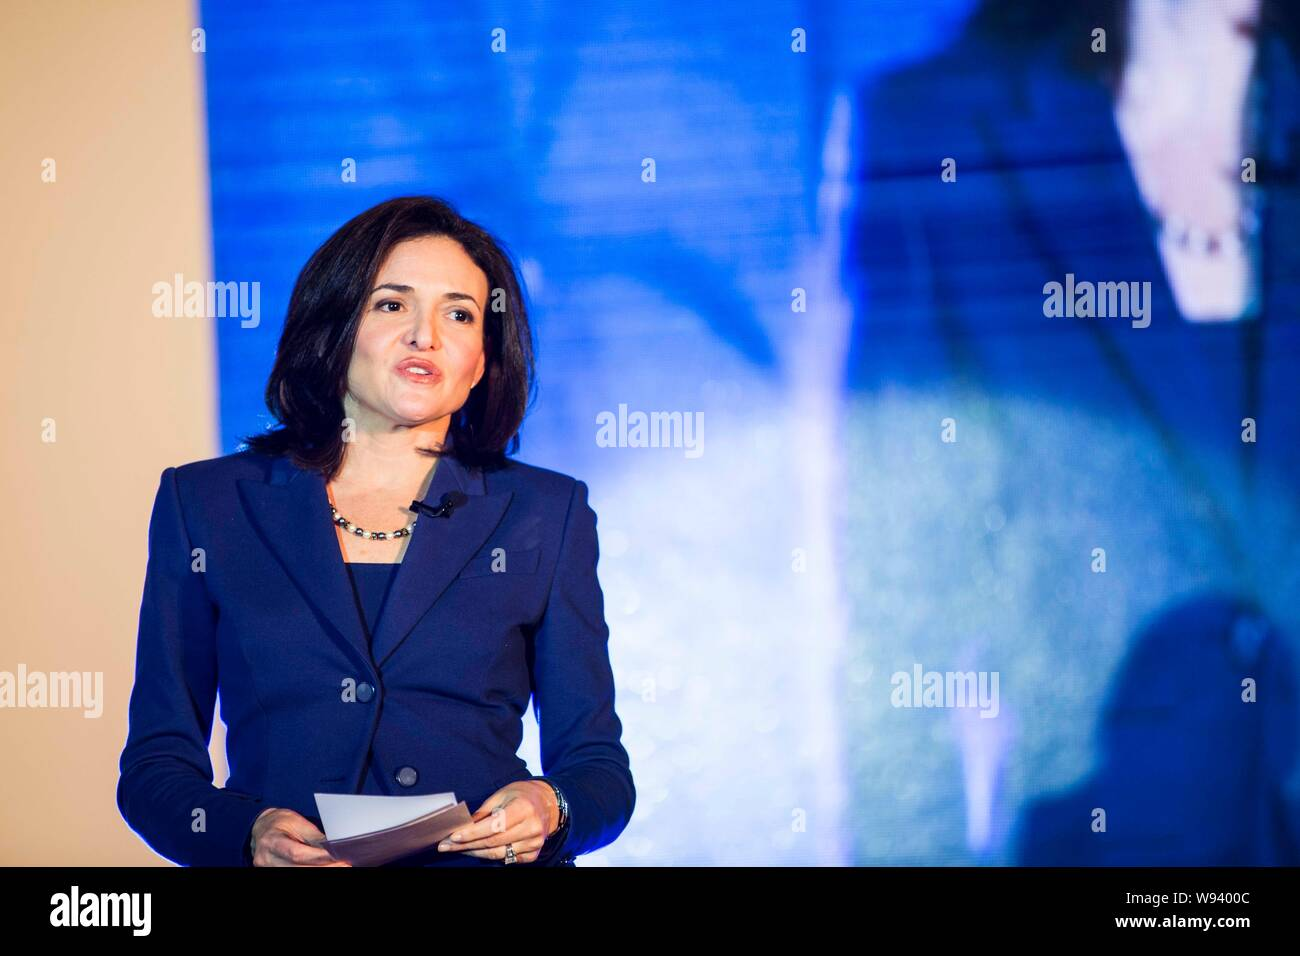 Sheryl Sandberg Stock Photos & Sheryl Sandberg Stock Images